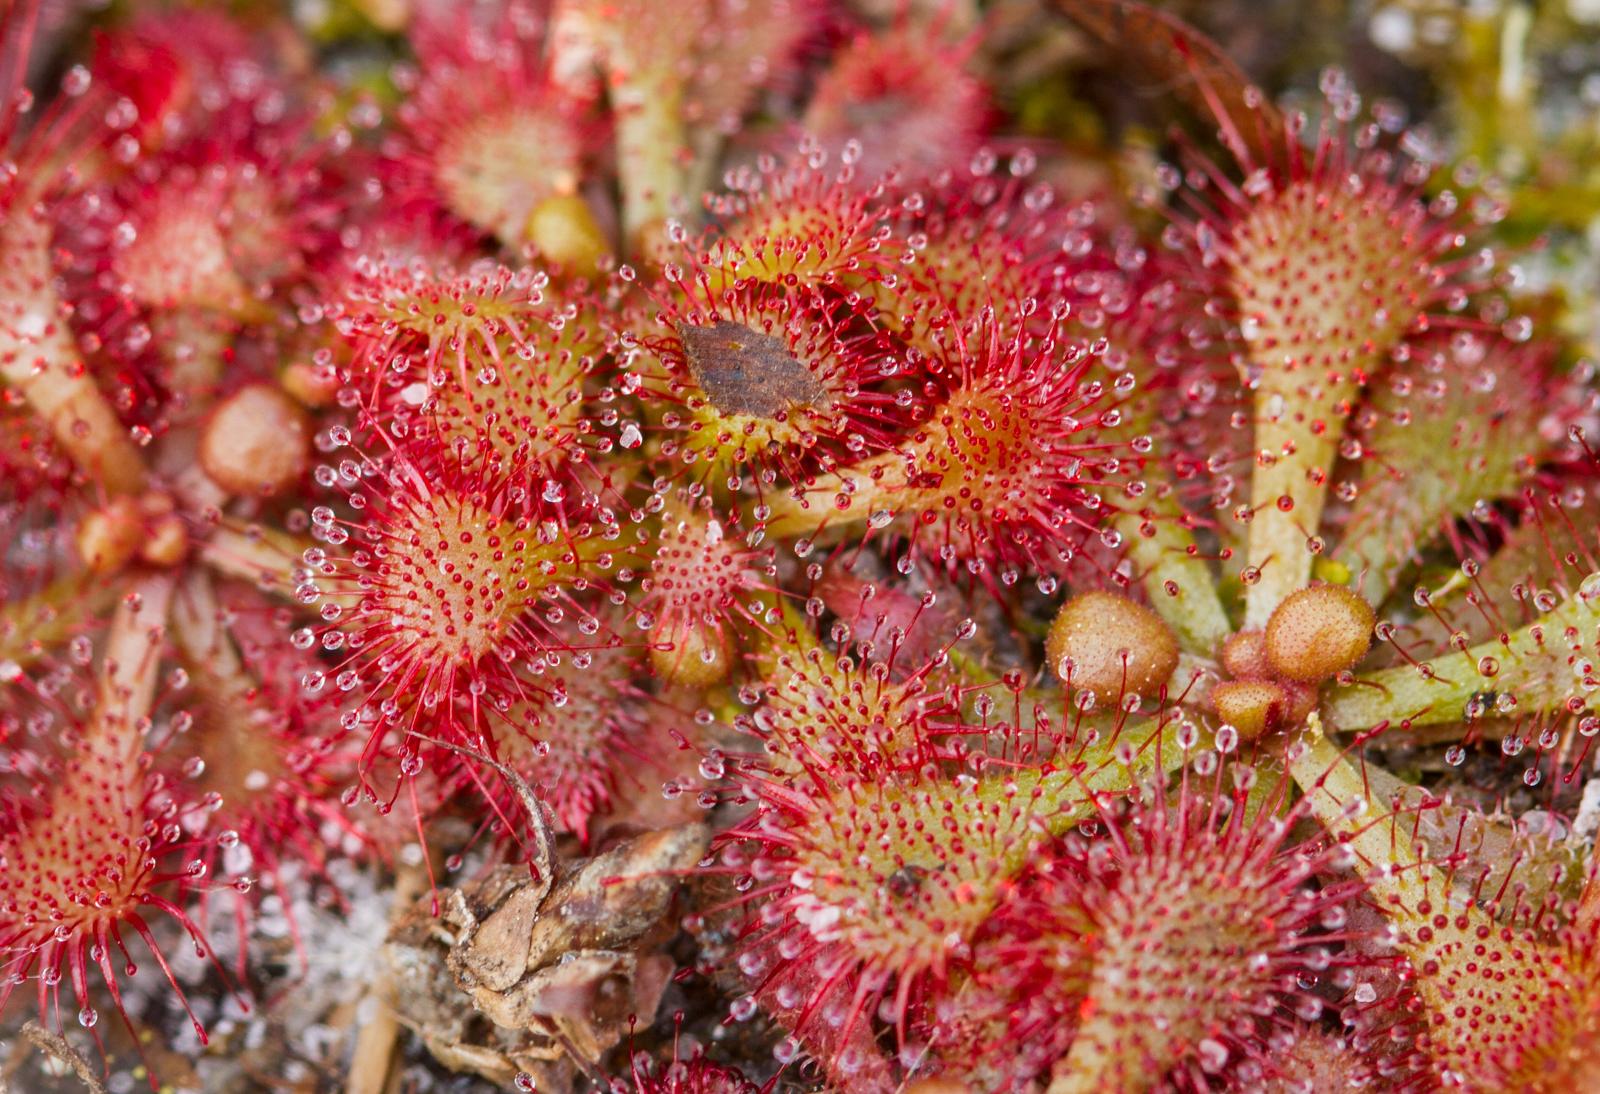 Close up of sundew plant